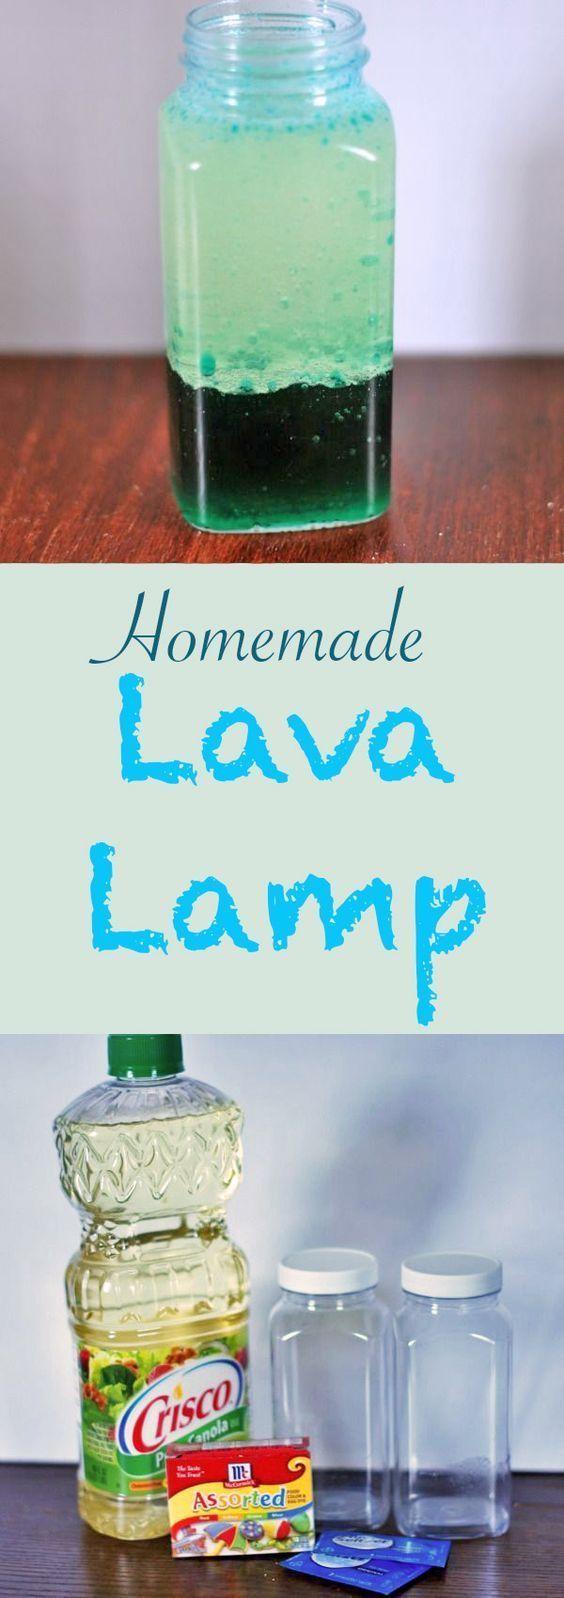 DIY Homemade Lava Lamp